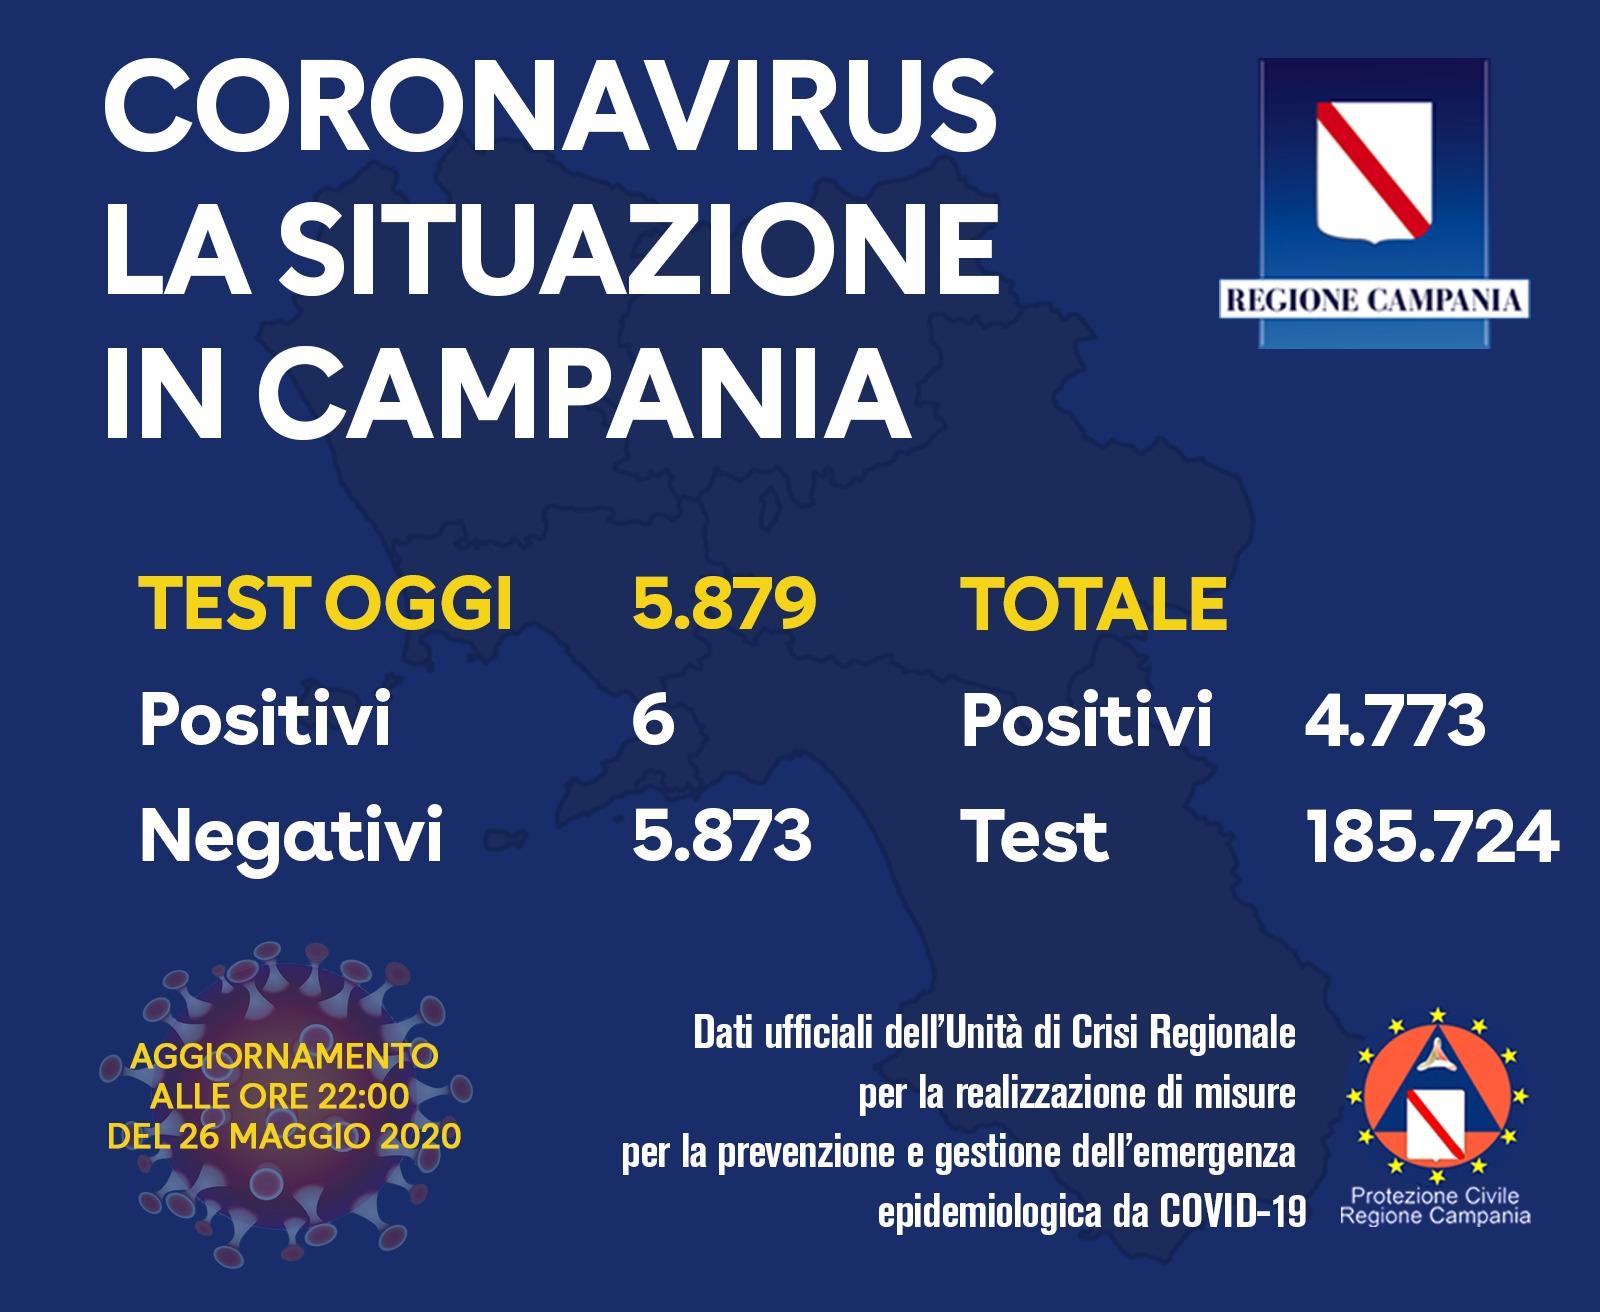 Campania. 6 i positivi di oggi su 5879 tamponi.